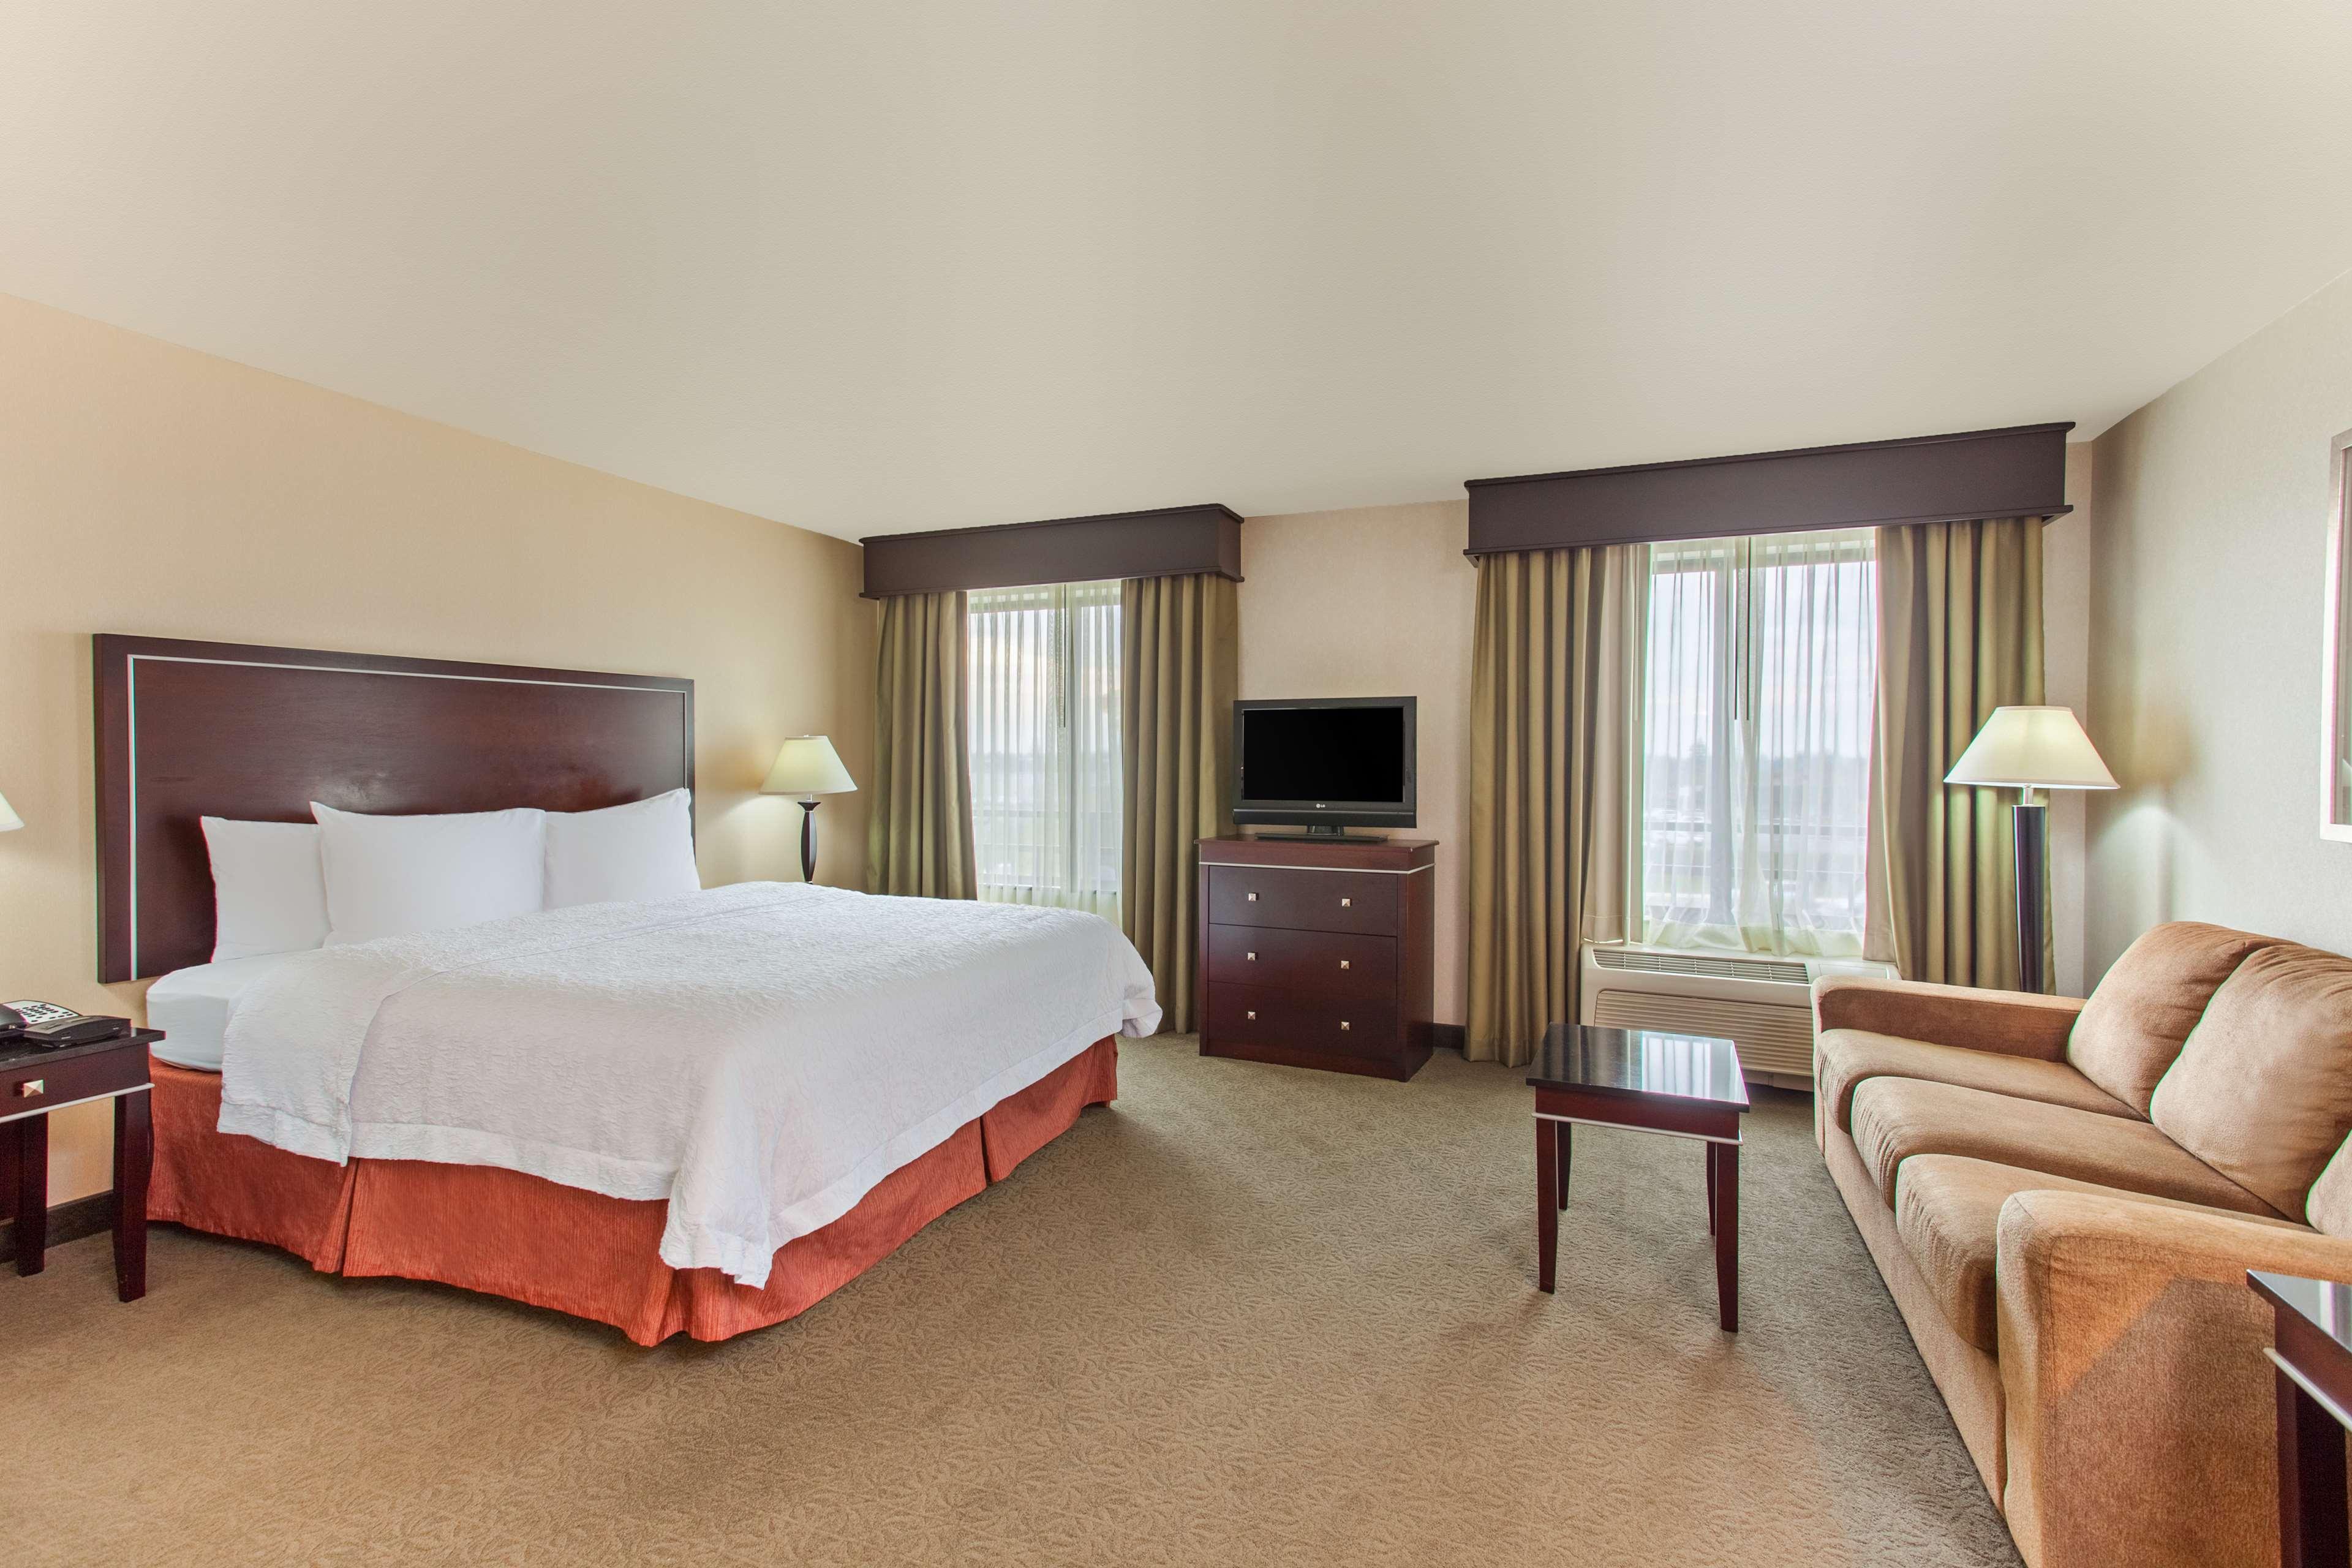 Hampton Inn & Suites Roseville image 10